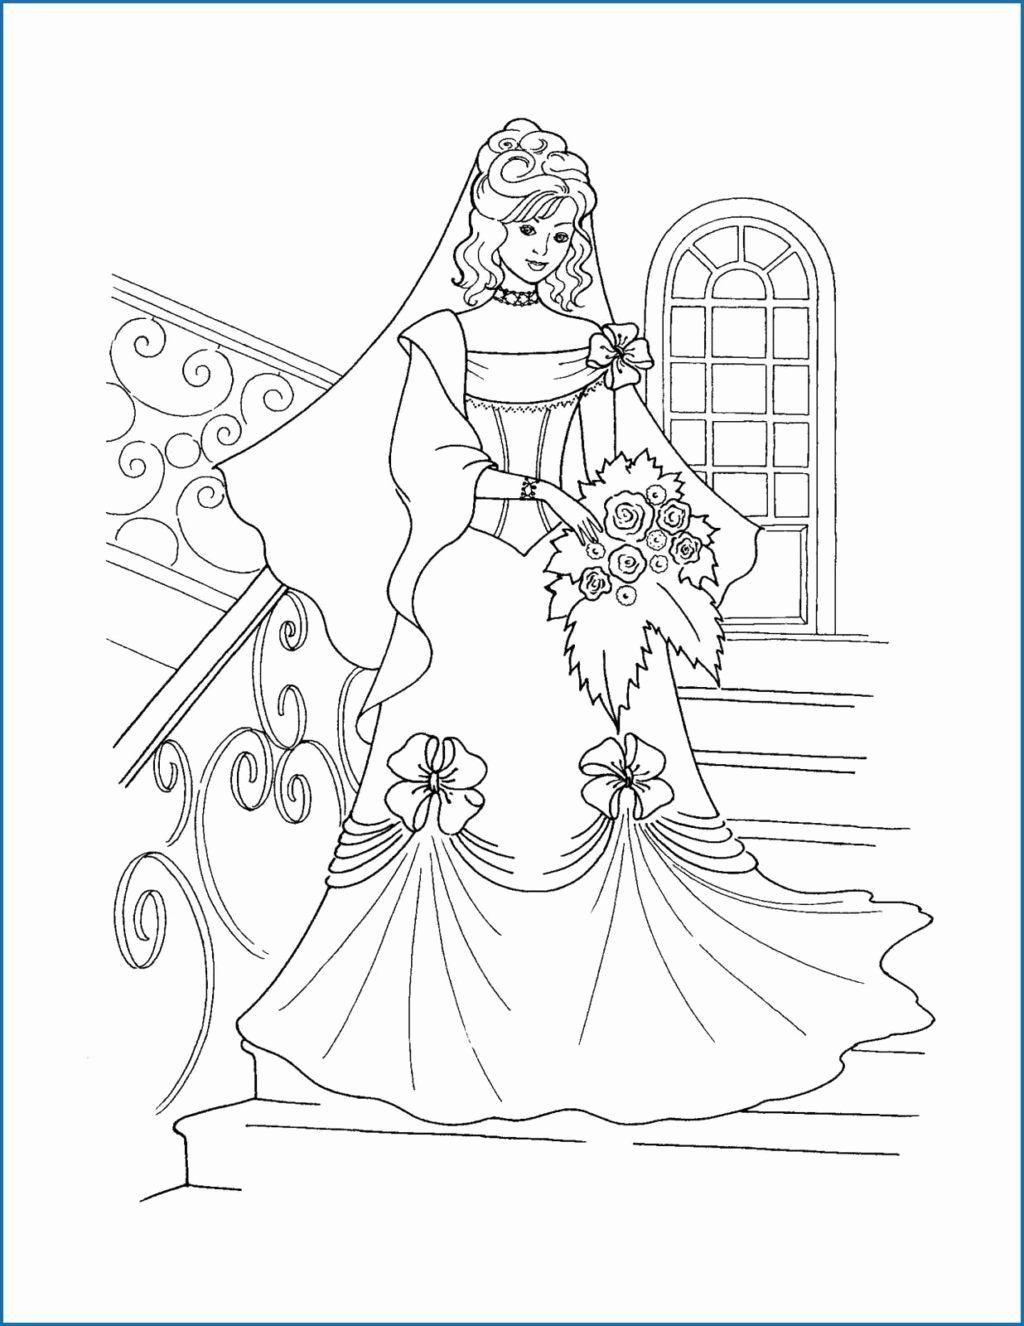 Coloring Dress Design Elegant Princess Coloring Pages To Print Best 10 Barbie Out Disney Princess Coloring Pages Princess Coloring Pages Wedding Coloring Pages